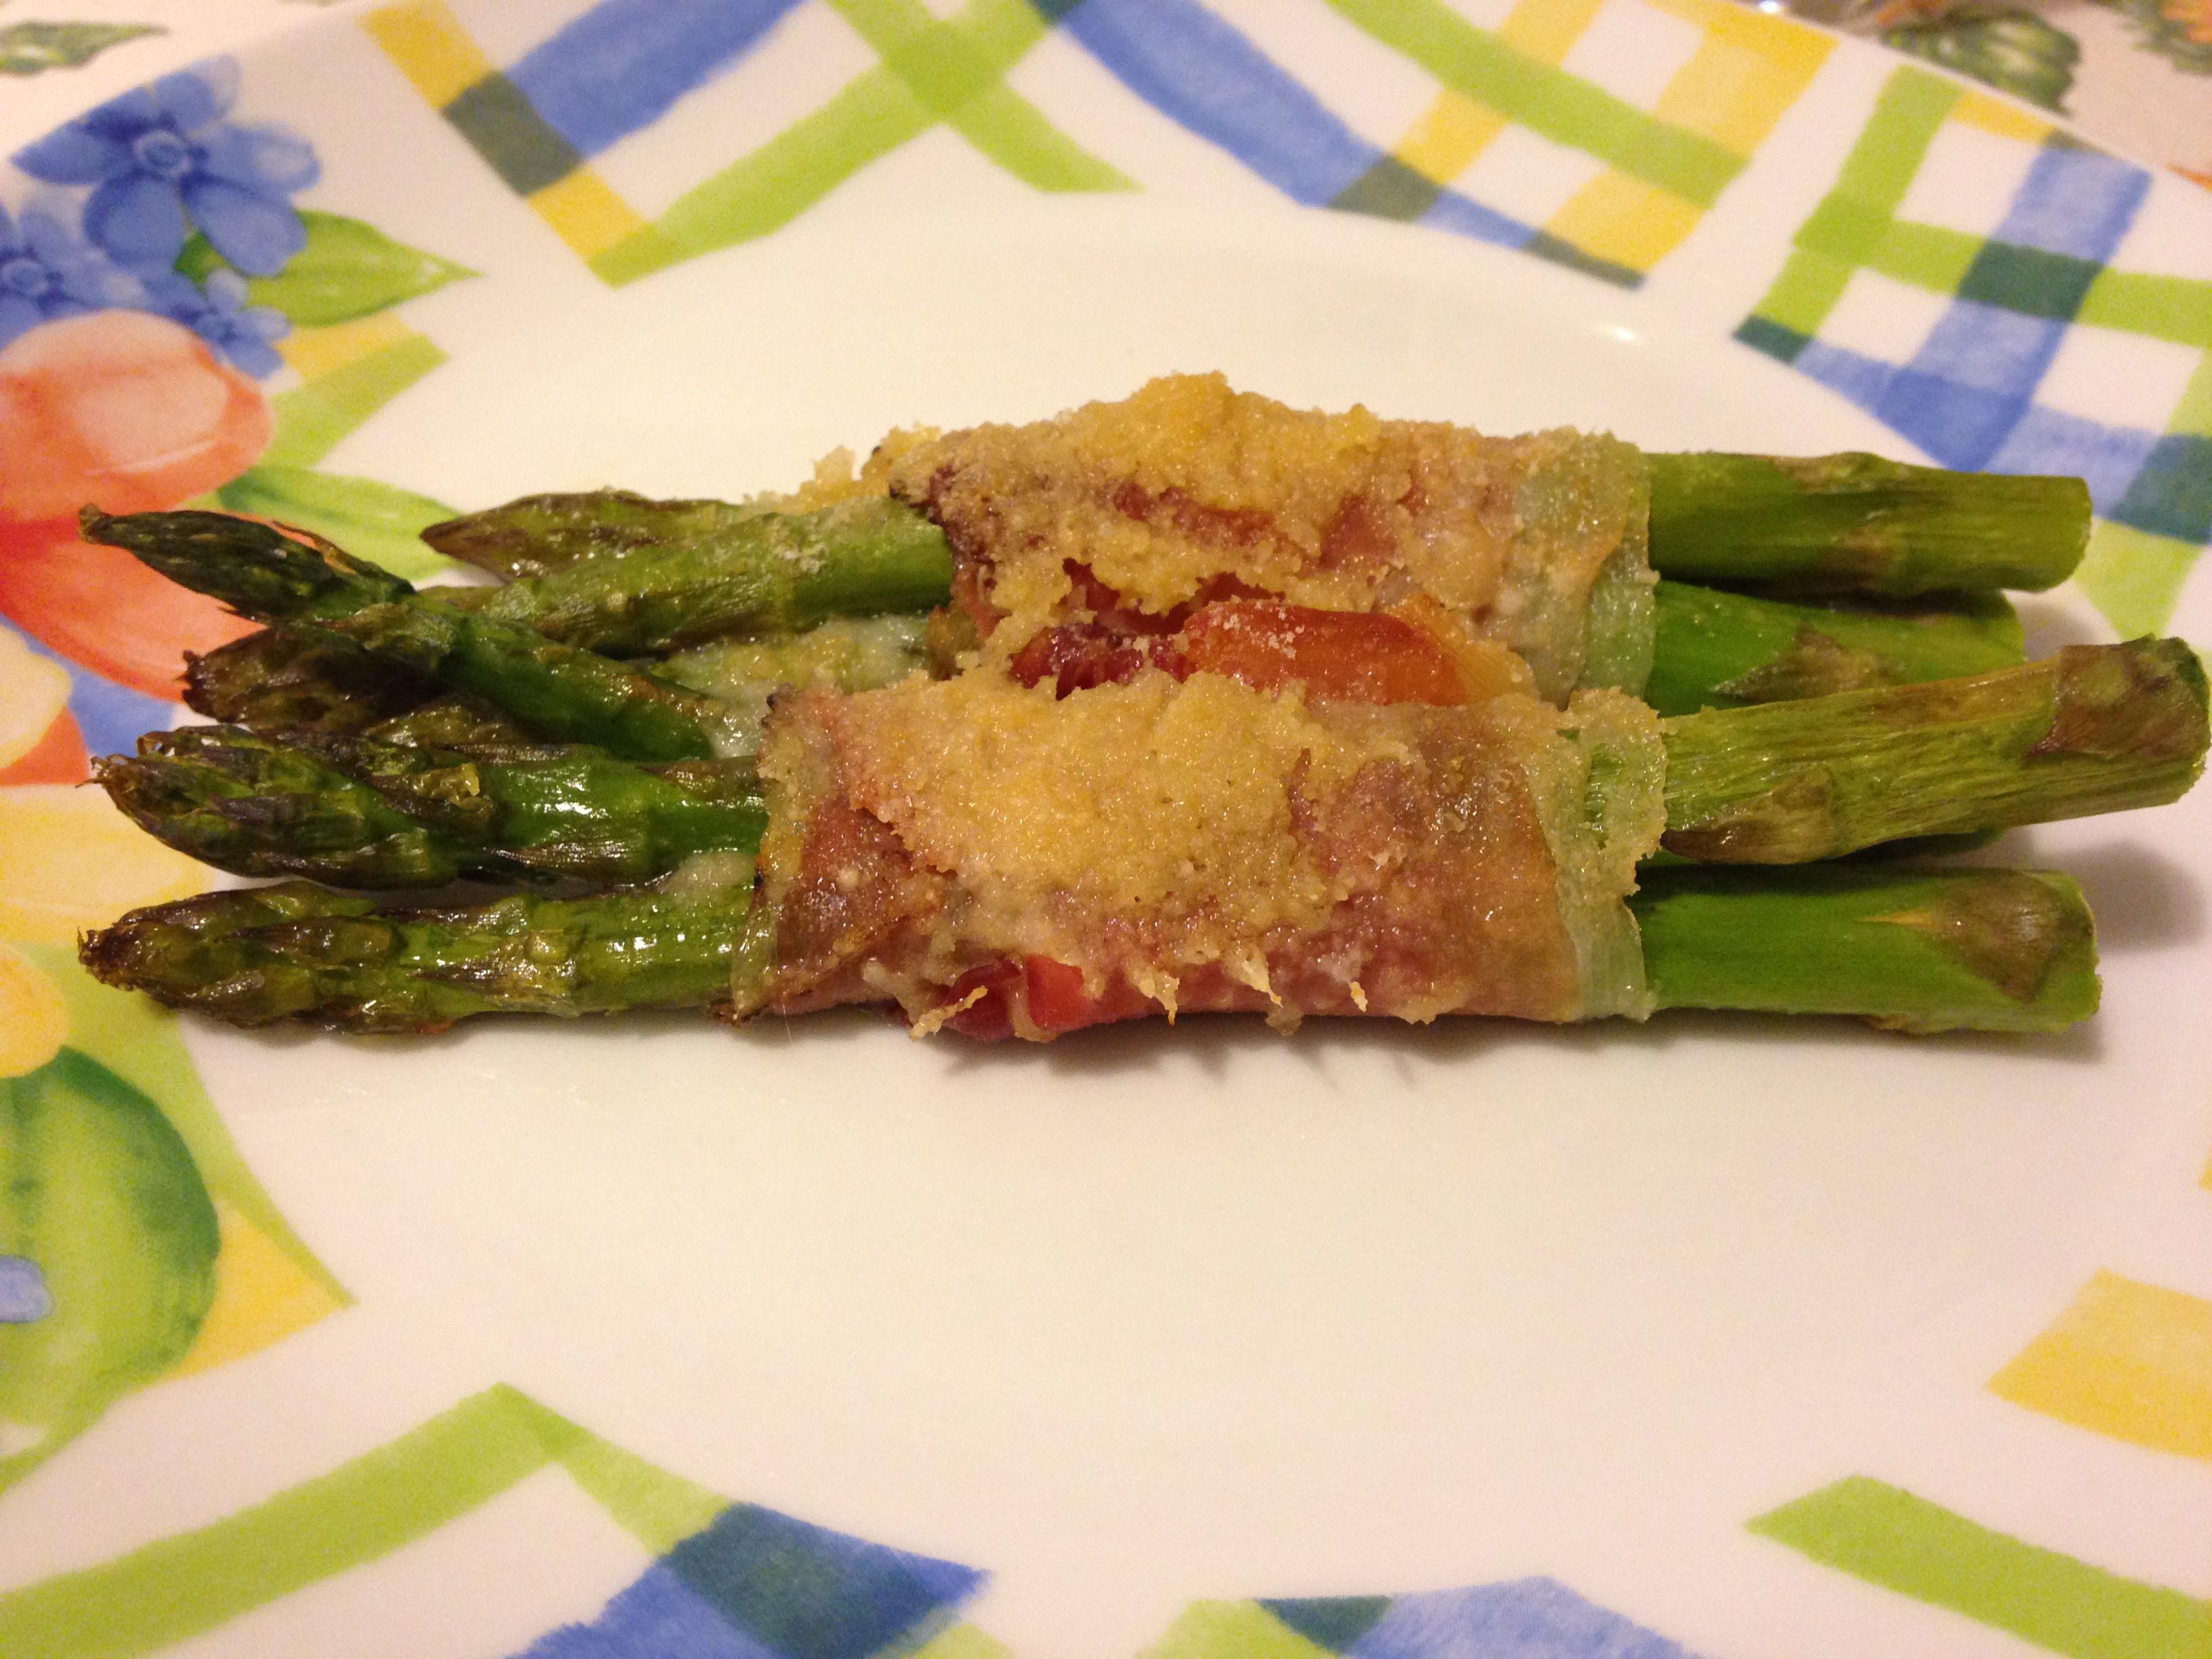 asparagi croccanti